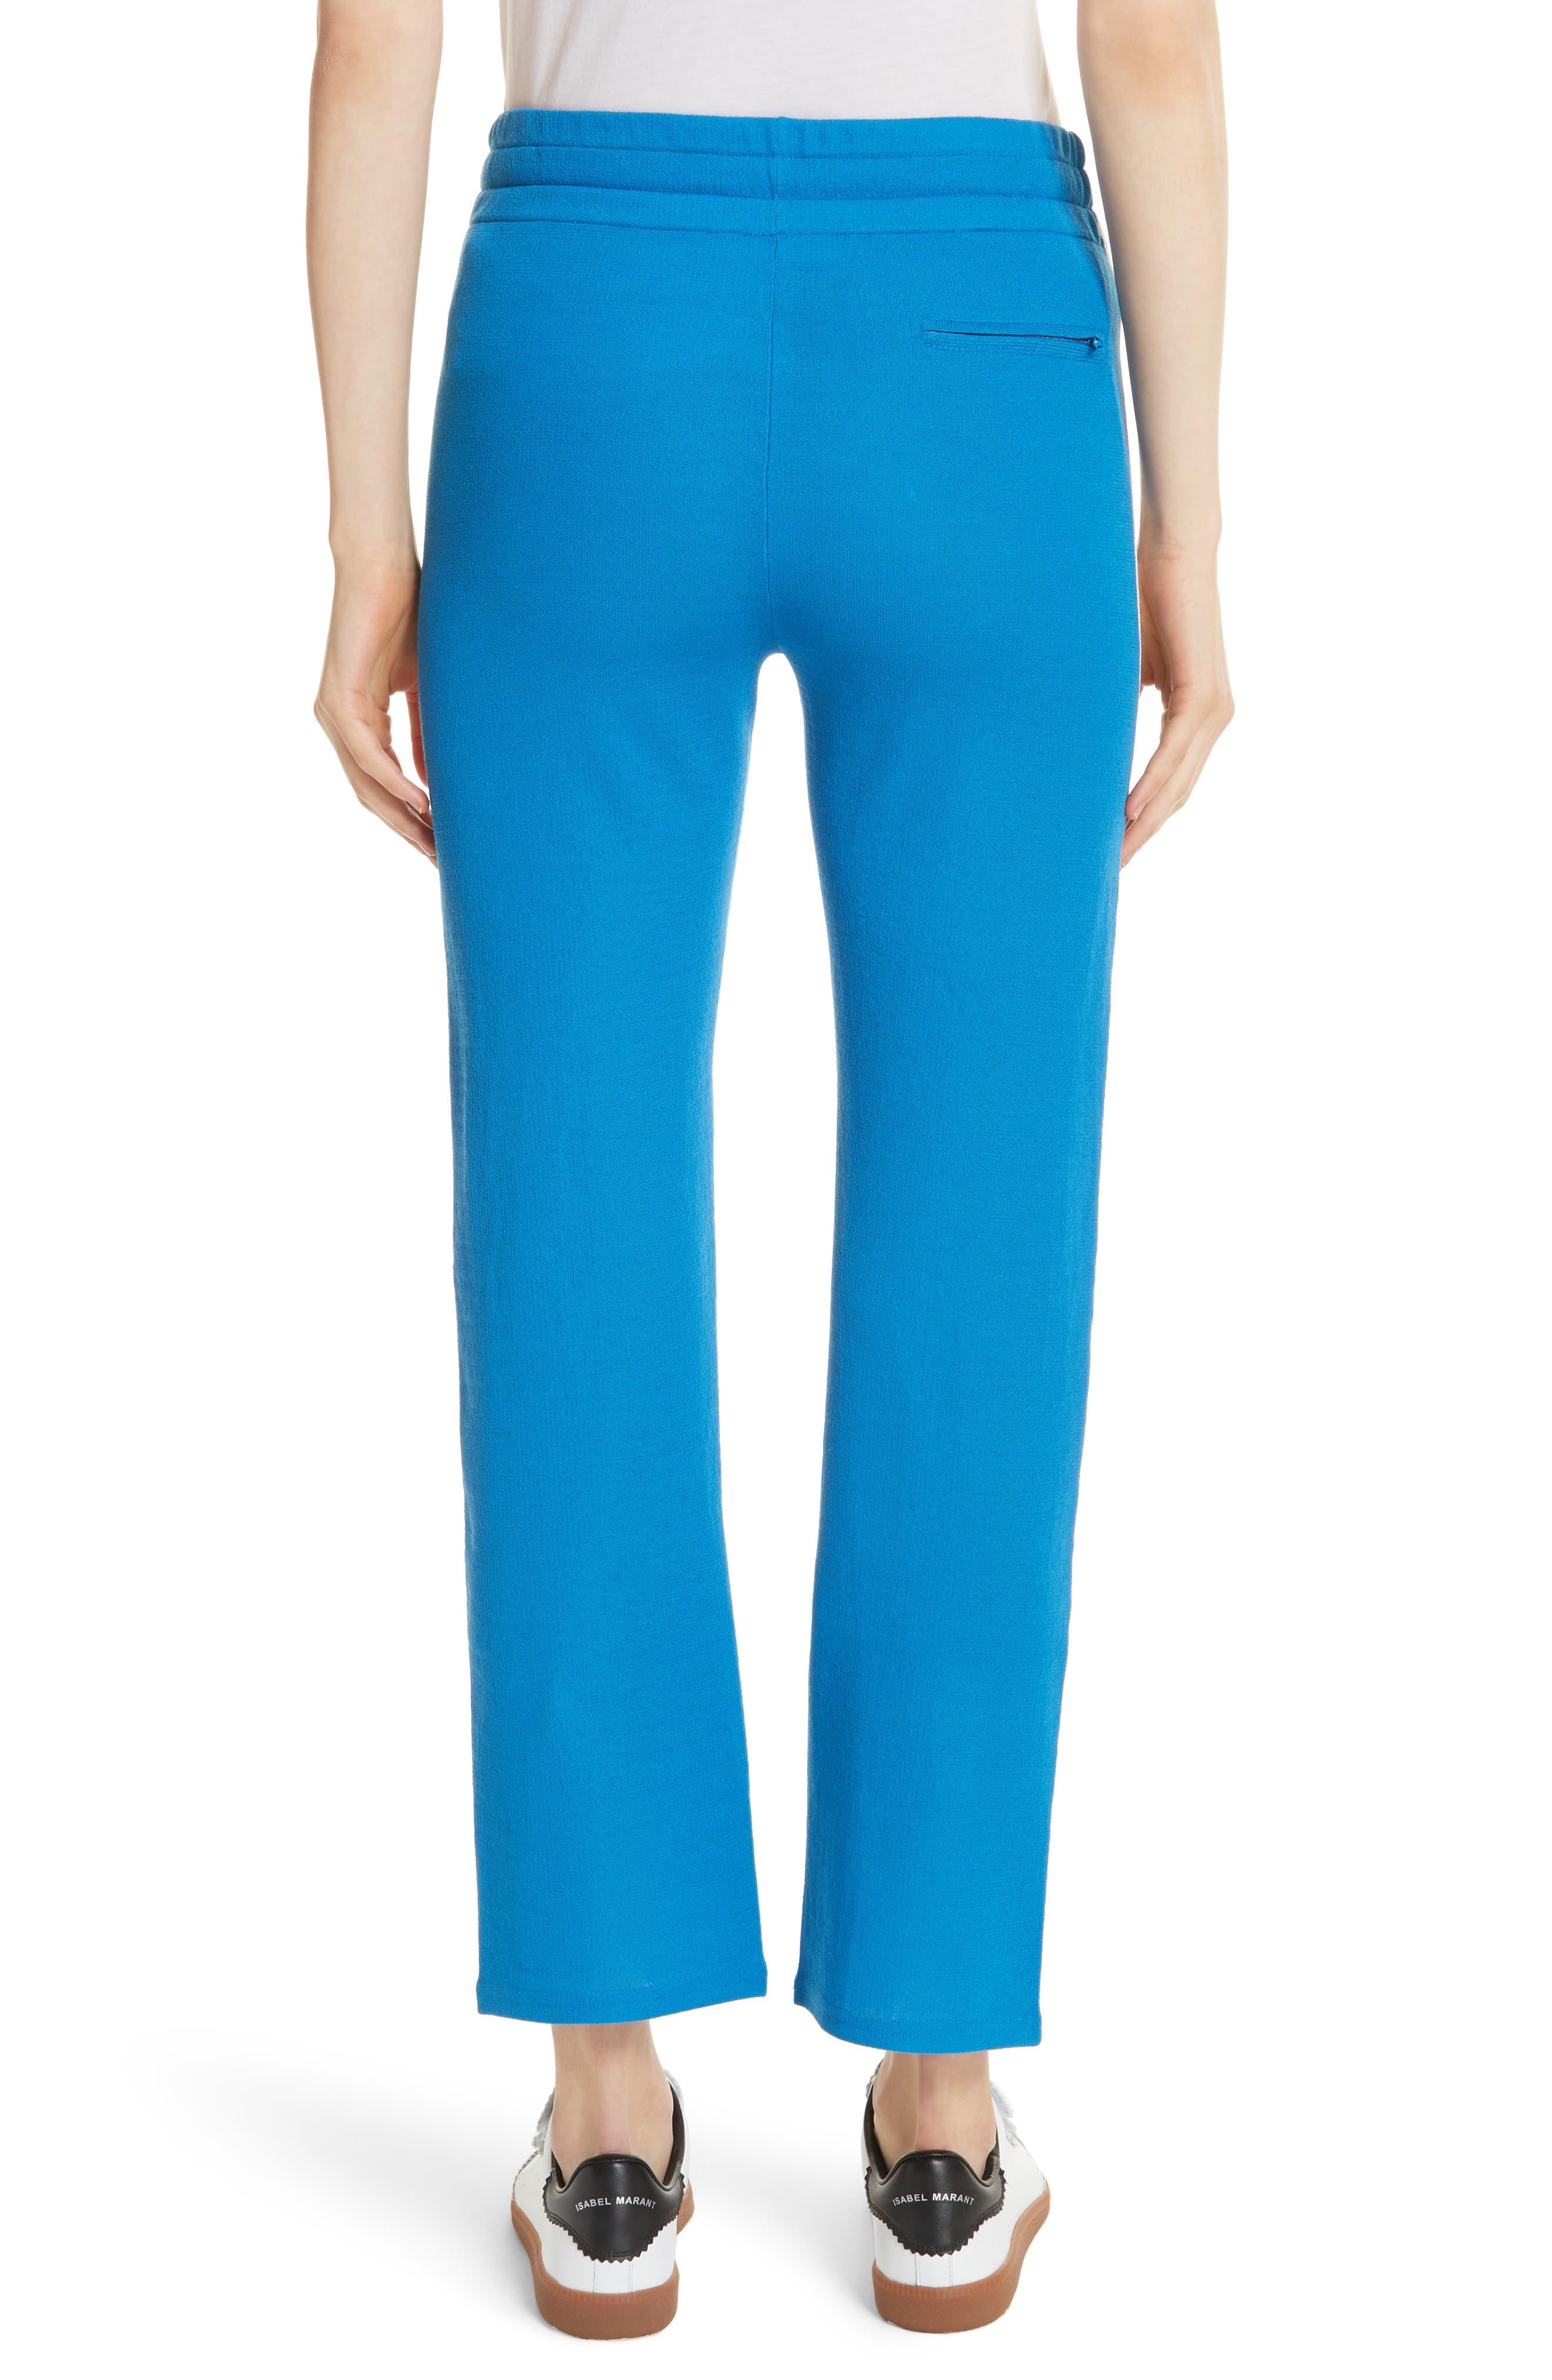 Isabel Marant Étoile Dobbs Pants,                             Alternate thumbnail 3, color,                             Electric Blue